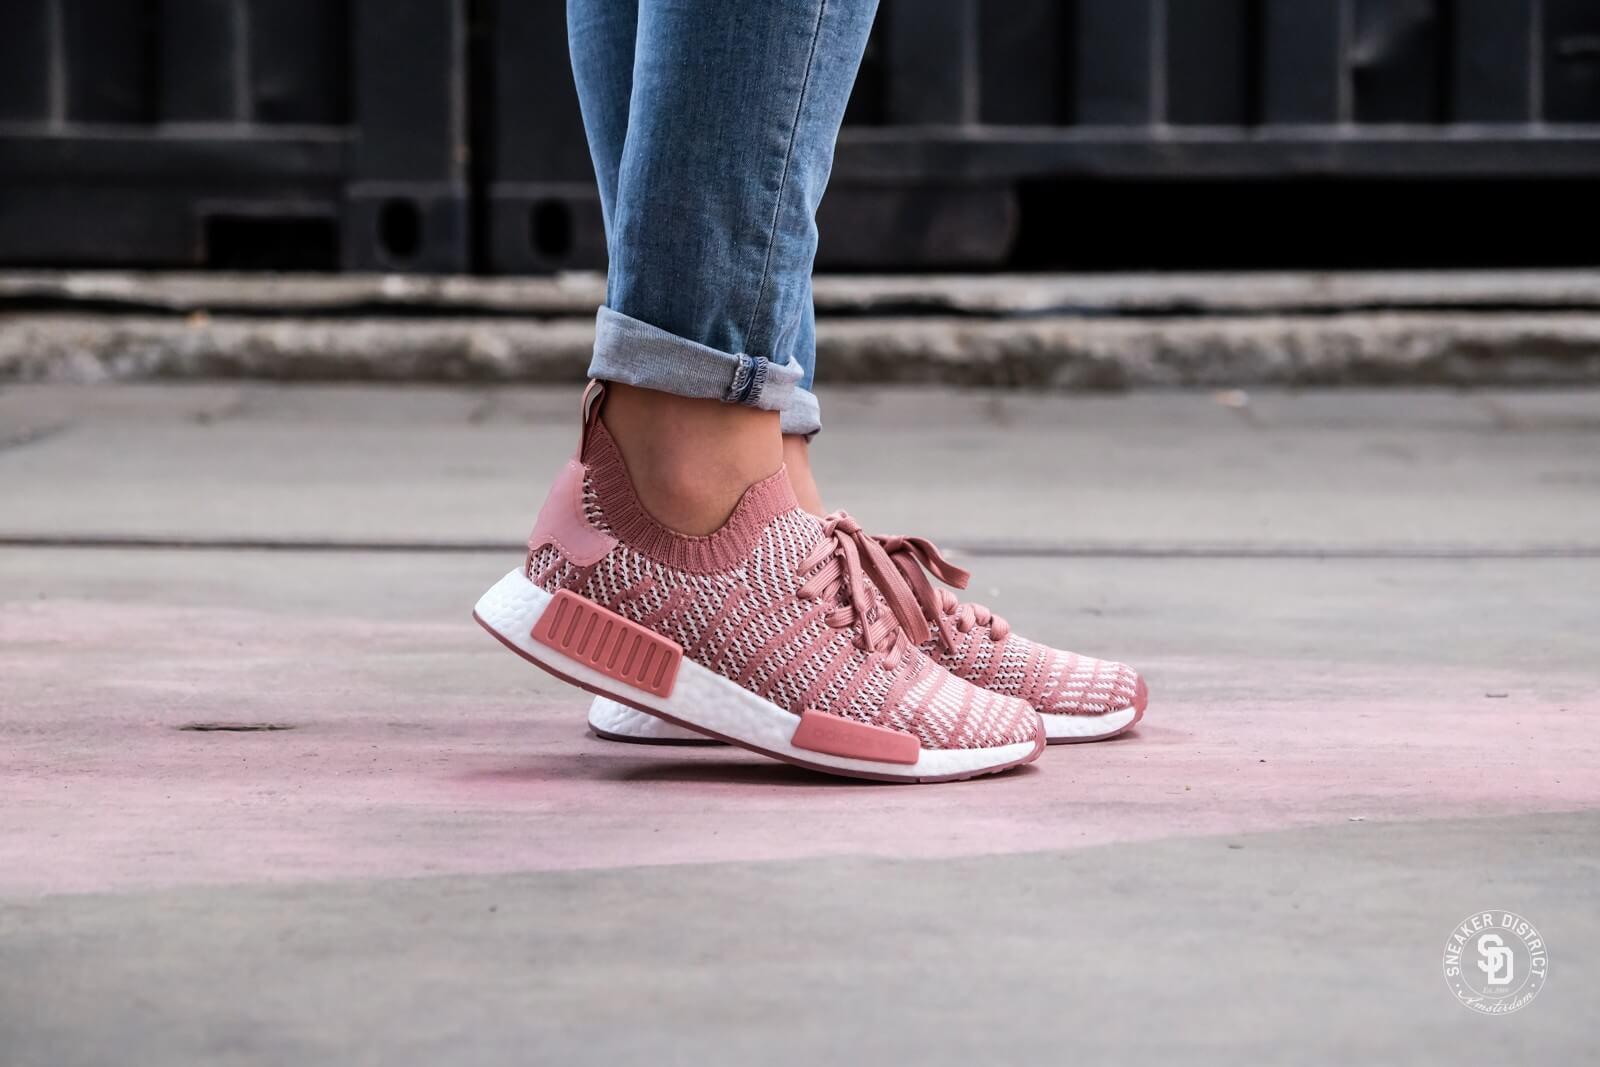 Adidas Women S Nmd R1 Stlt Primeknit Ash Pink Orchid Tint Footwear